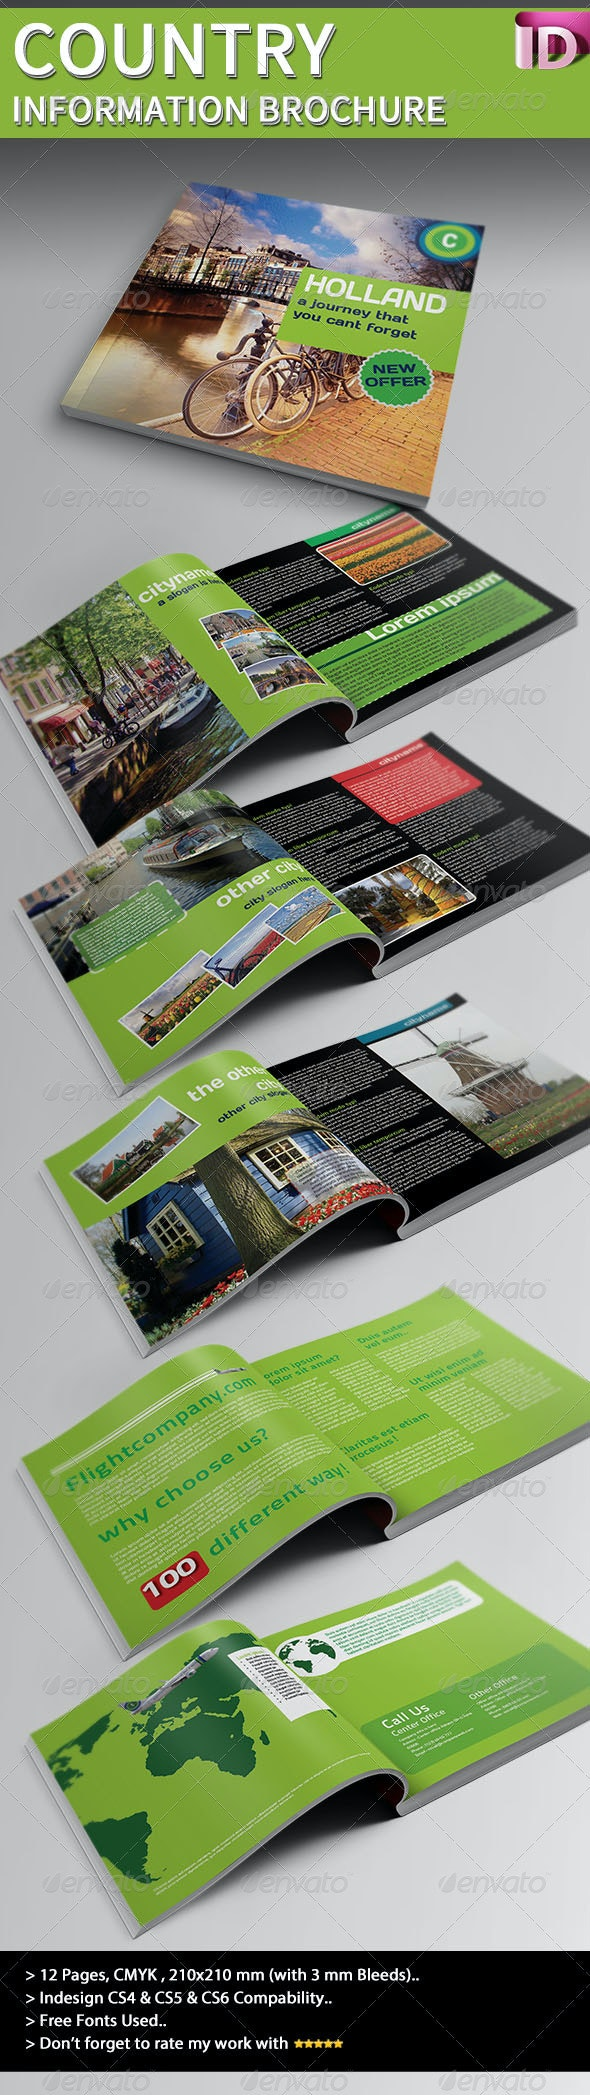 Country Information Brochure - Corporate Brochures